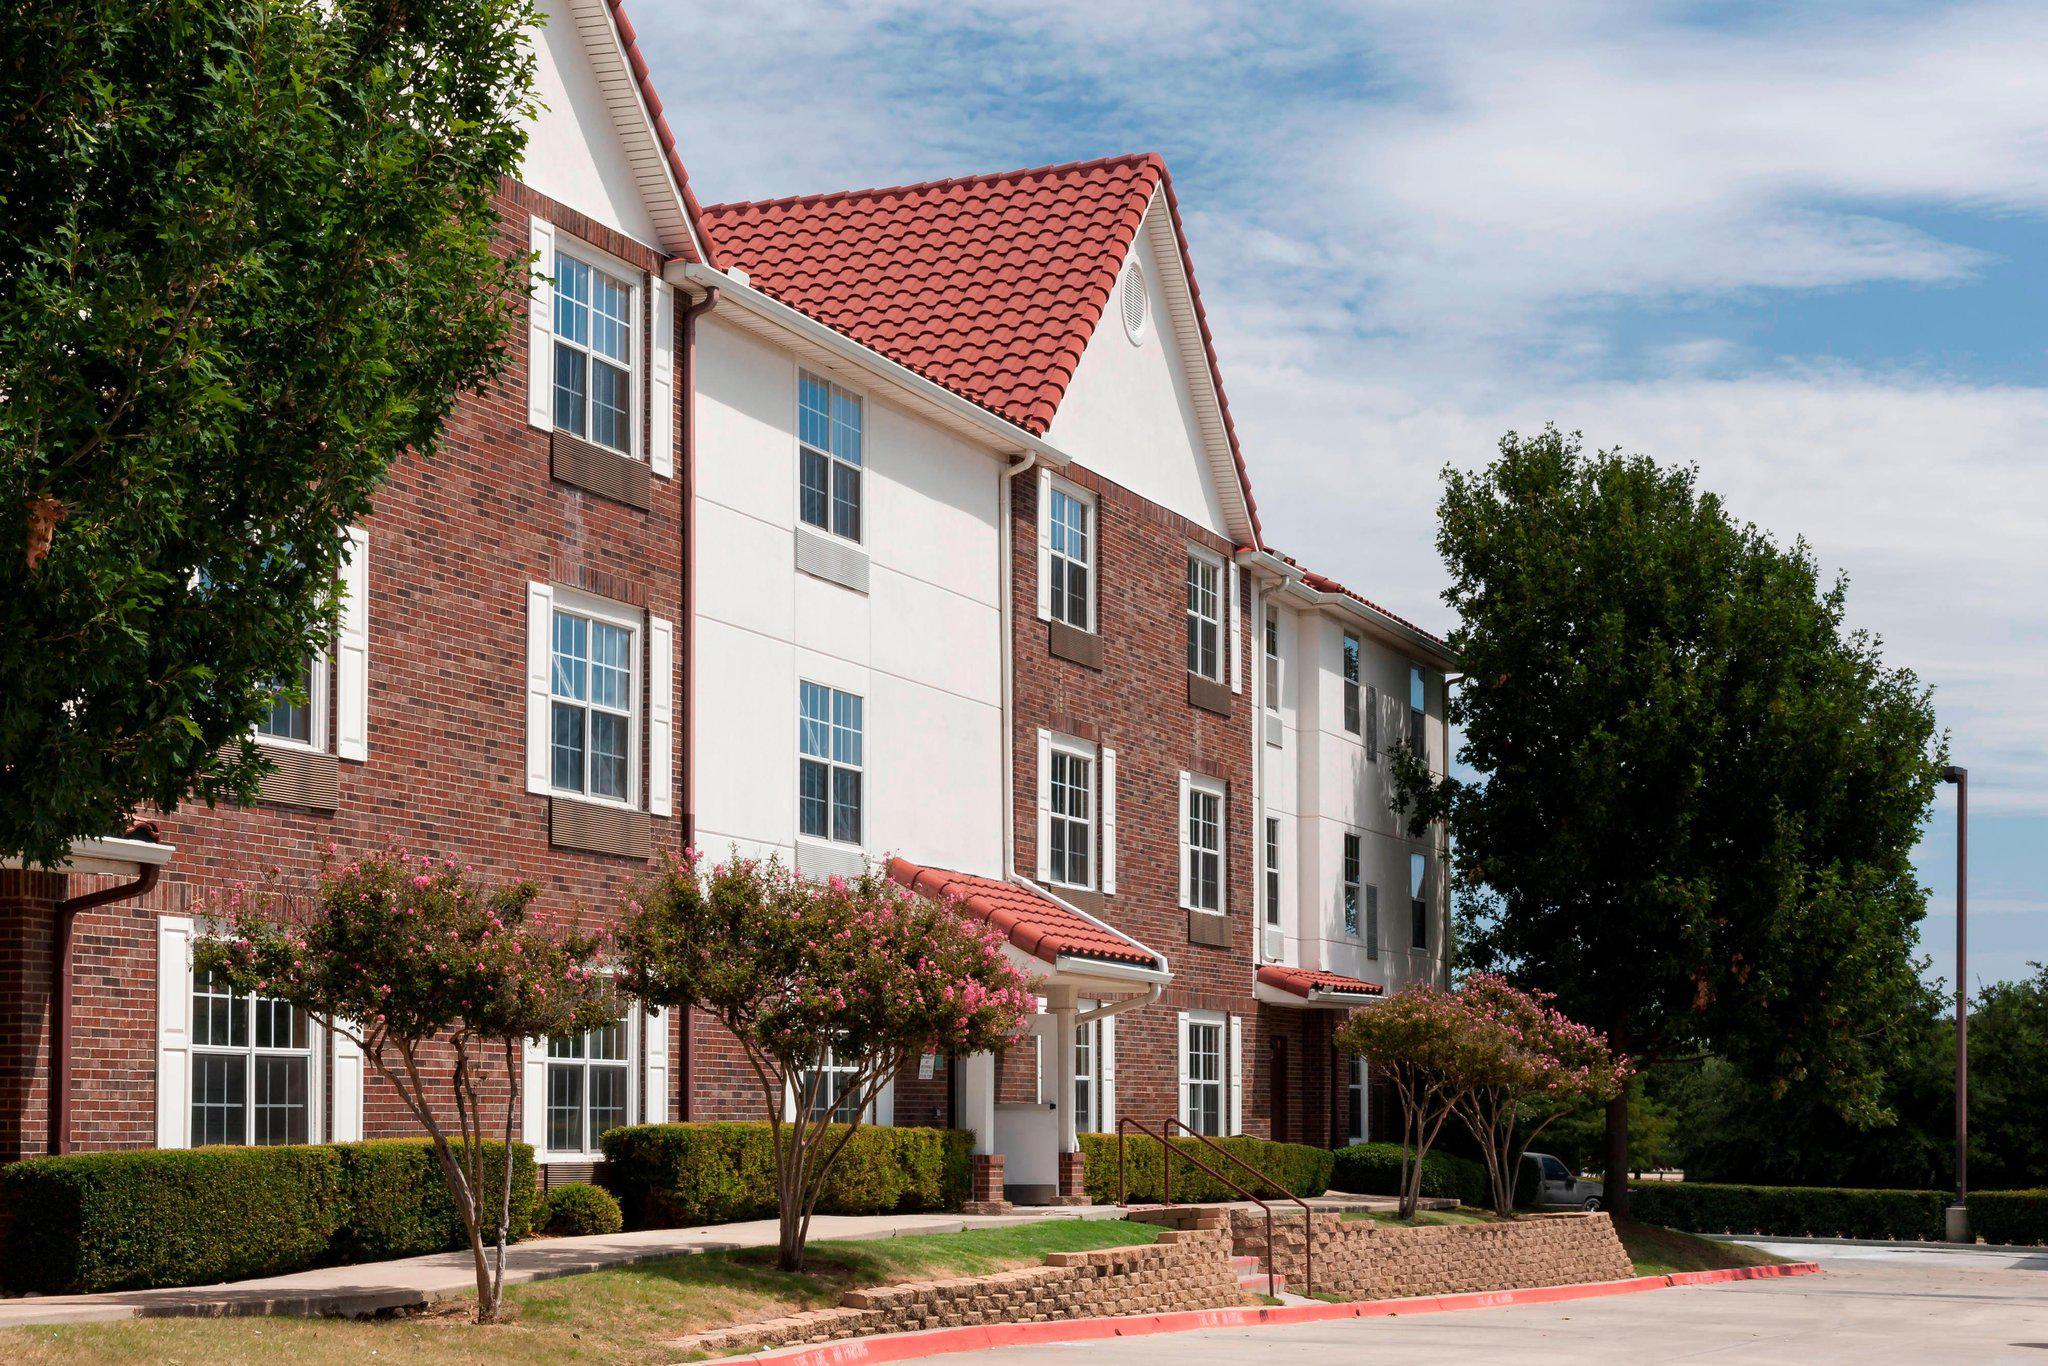 TownePlace Suites by Marriott Dallas Las Colinas